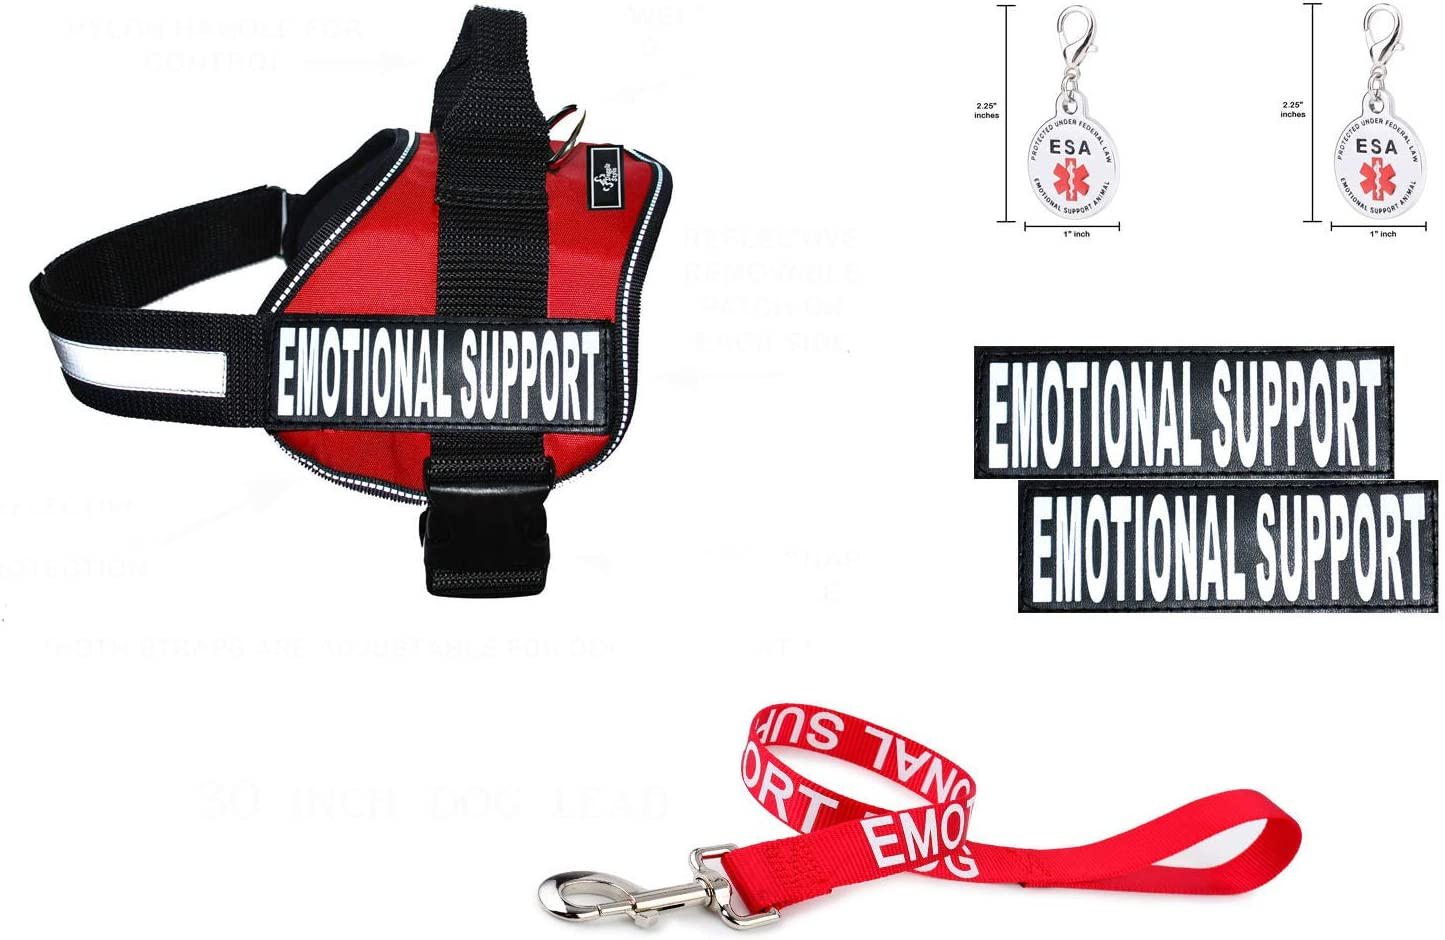 Doggie Stylz Super Special 5% OFF SALE held Official Emotional Support ESA Vest Harness Bundle